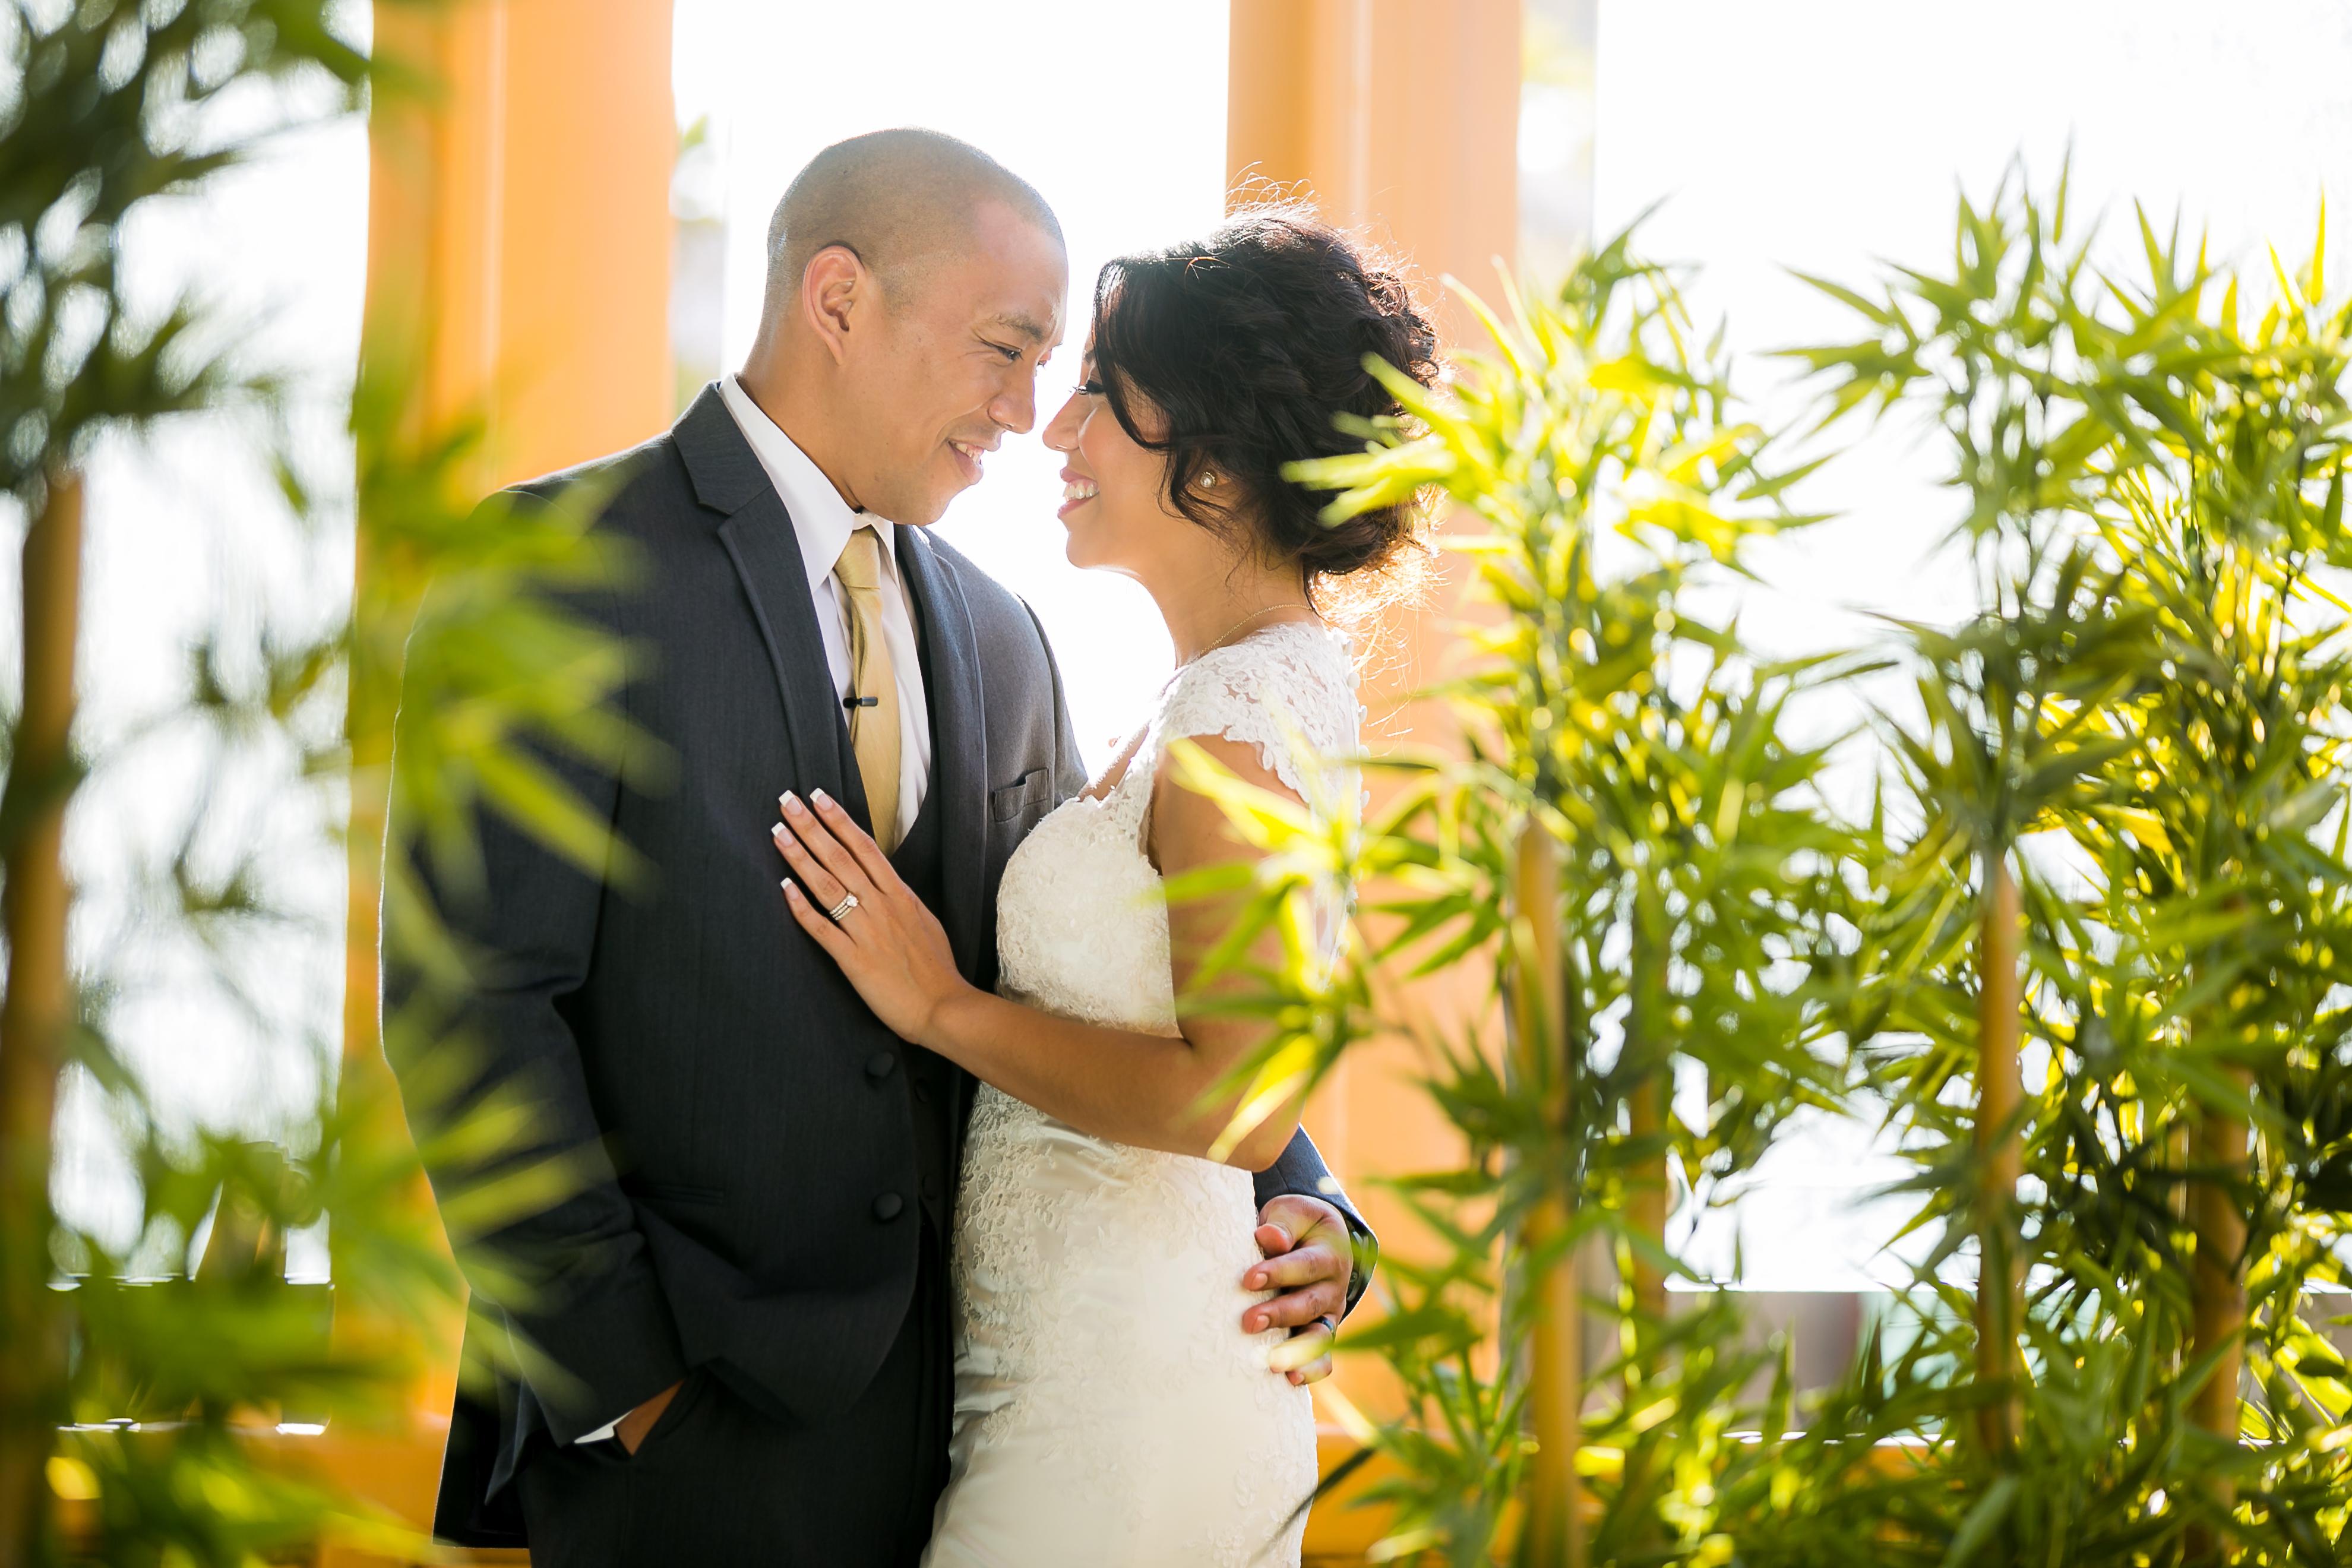 Seven degrees laguna beach wedding videography for Laguna beach wedding venues